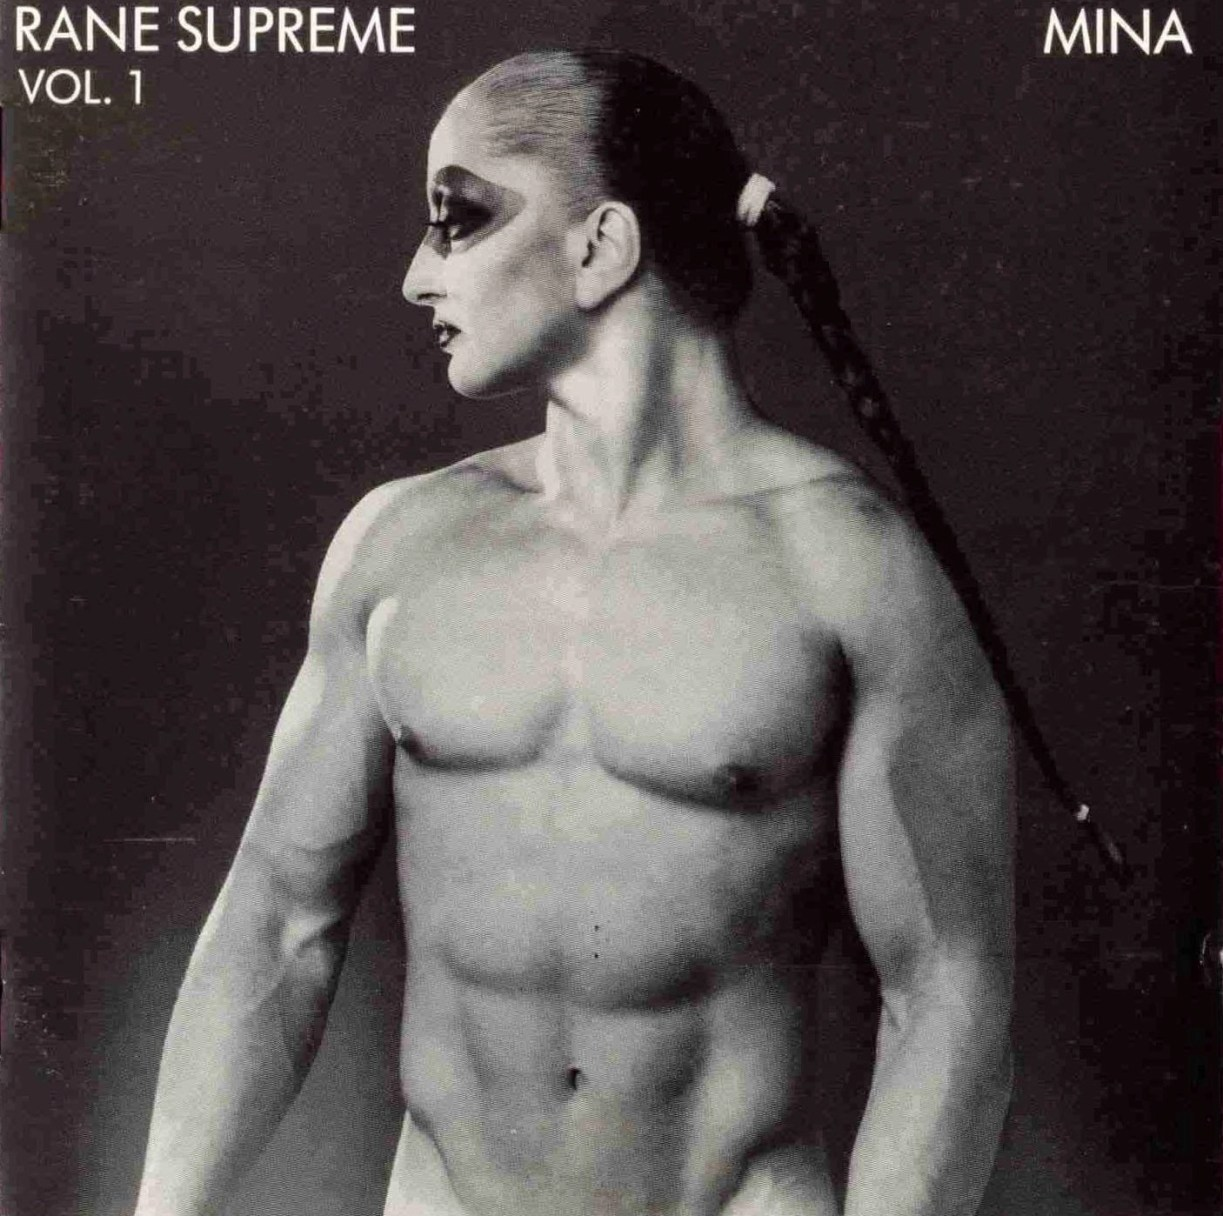 Mina - Rane Supreme - 1987